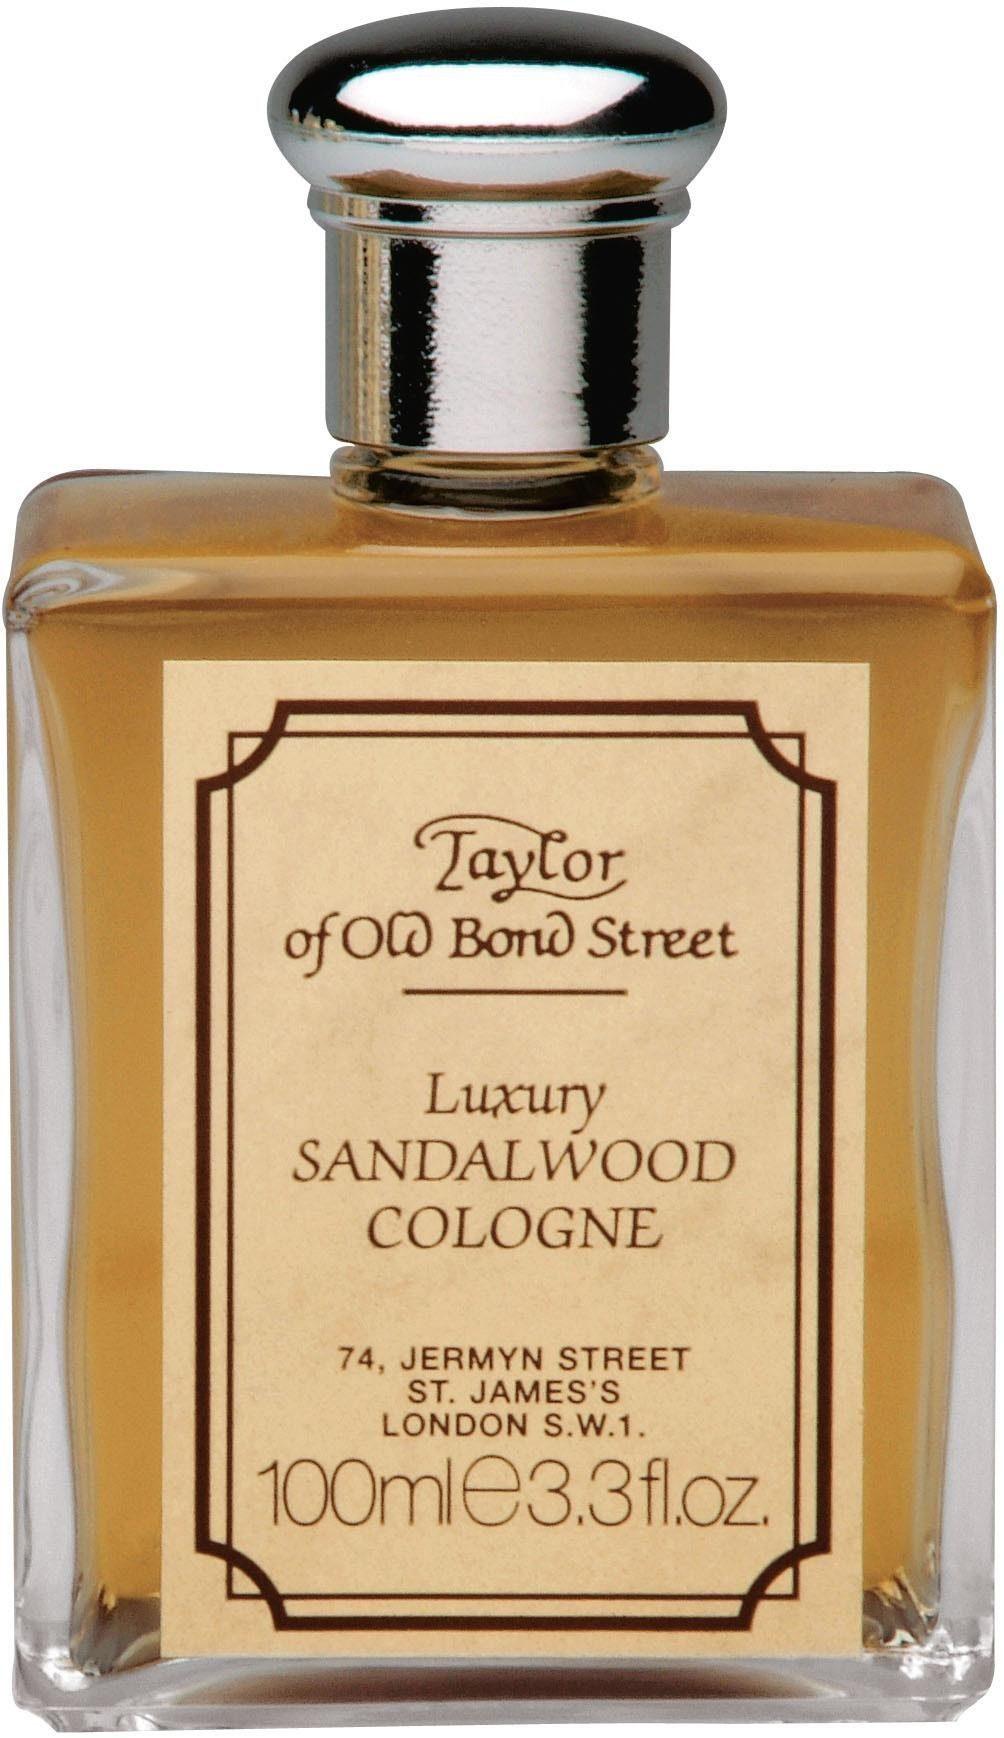 Taylor of Old Bond Street, »Luxury Sandlewood«, Eau de Cologne